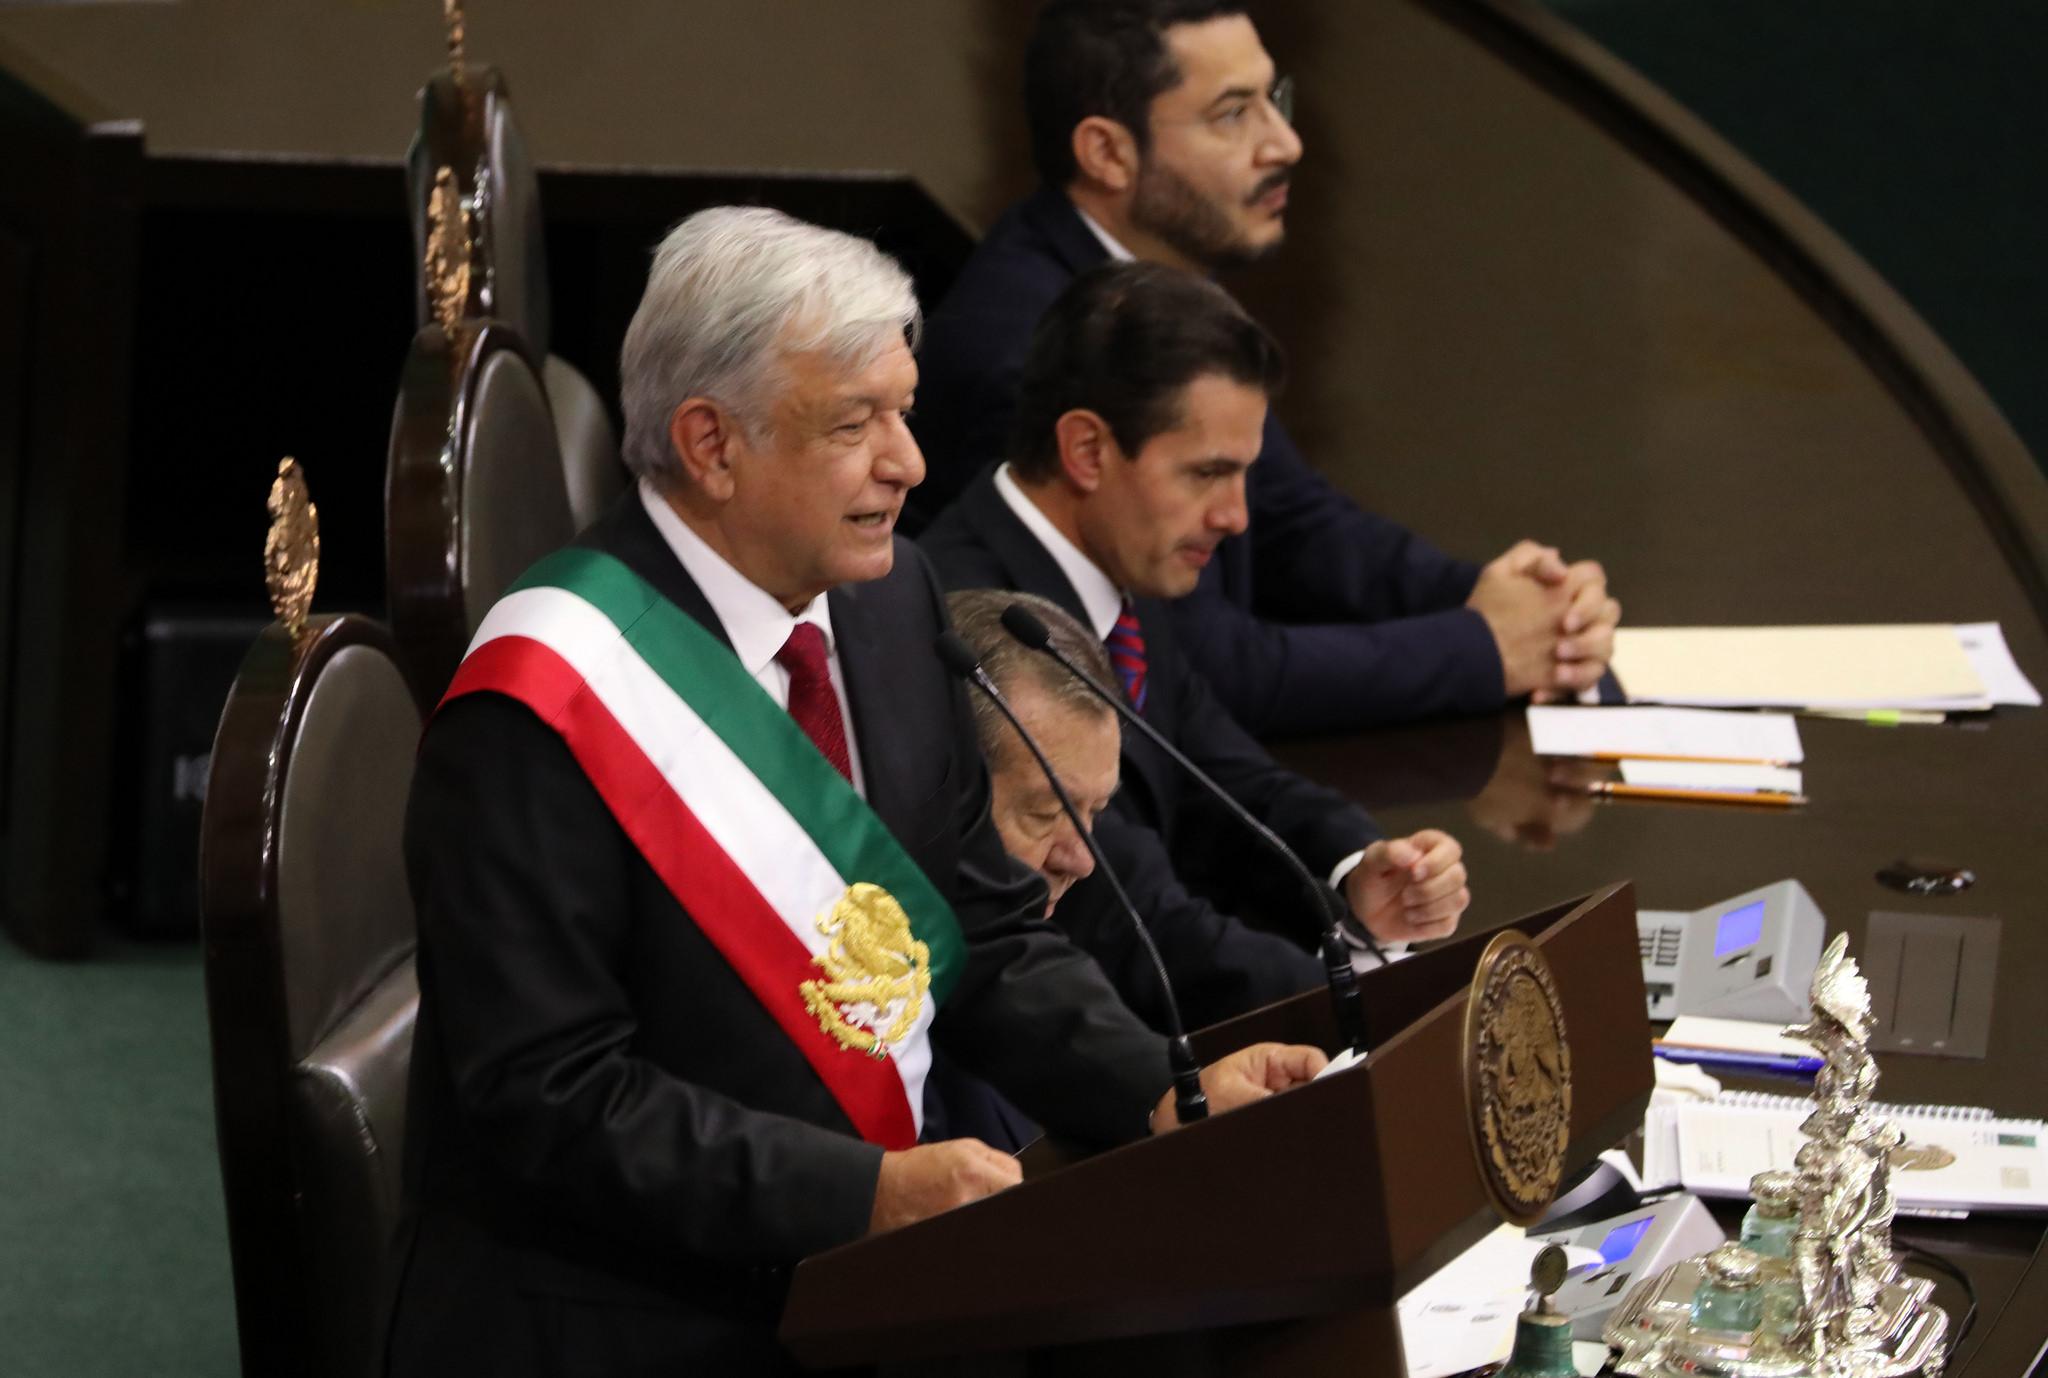 Presidente do México no palácio legislativo. Foto: Jonathan Miranda/Presidencia de la República